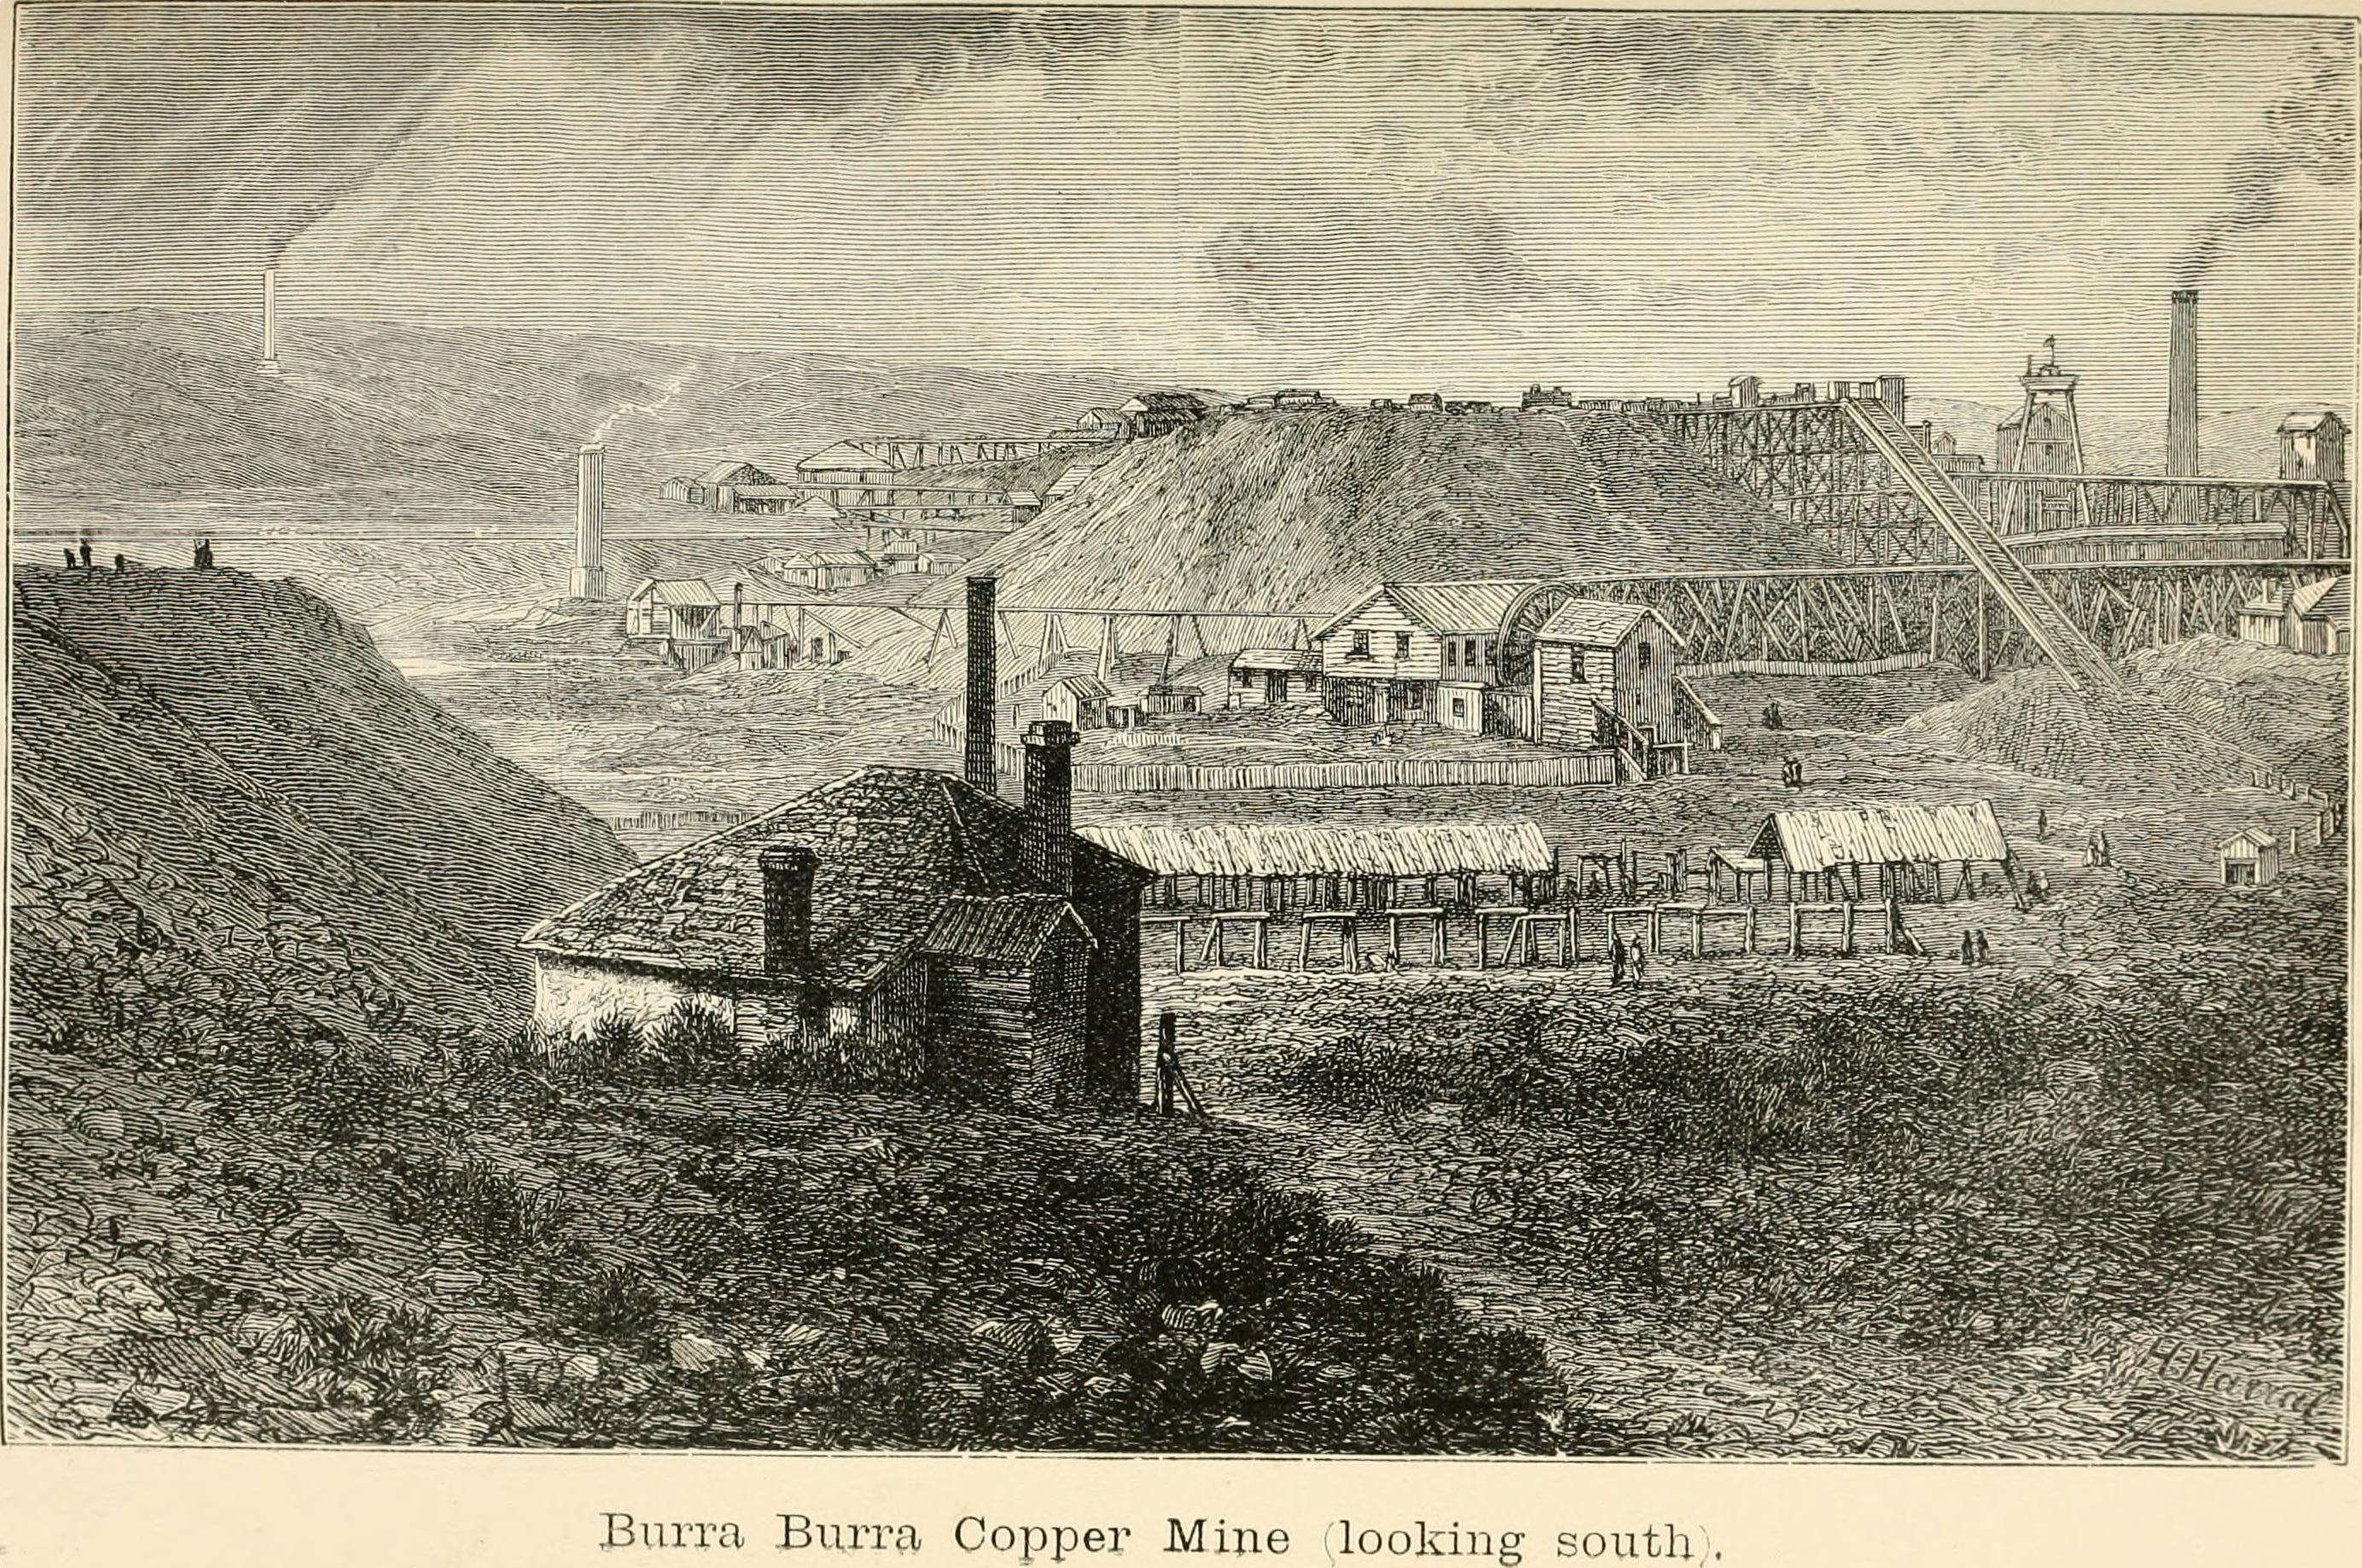 1883 drawing of the Burra Burra Mine.